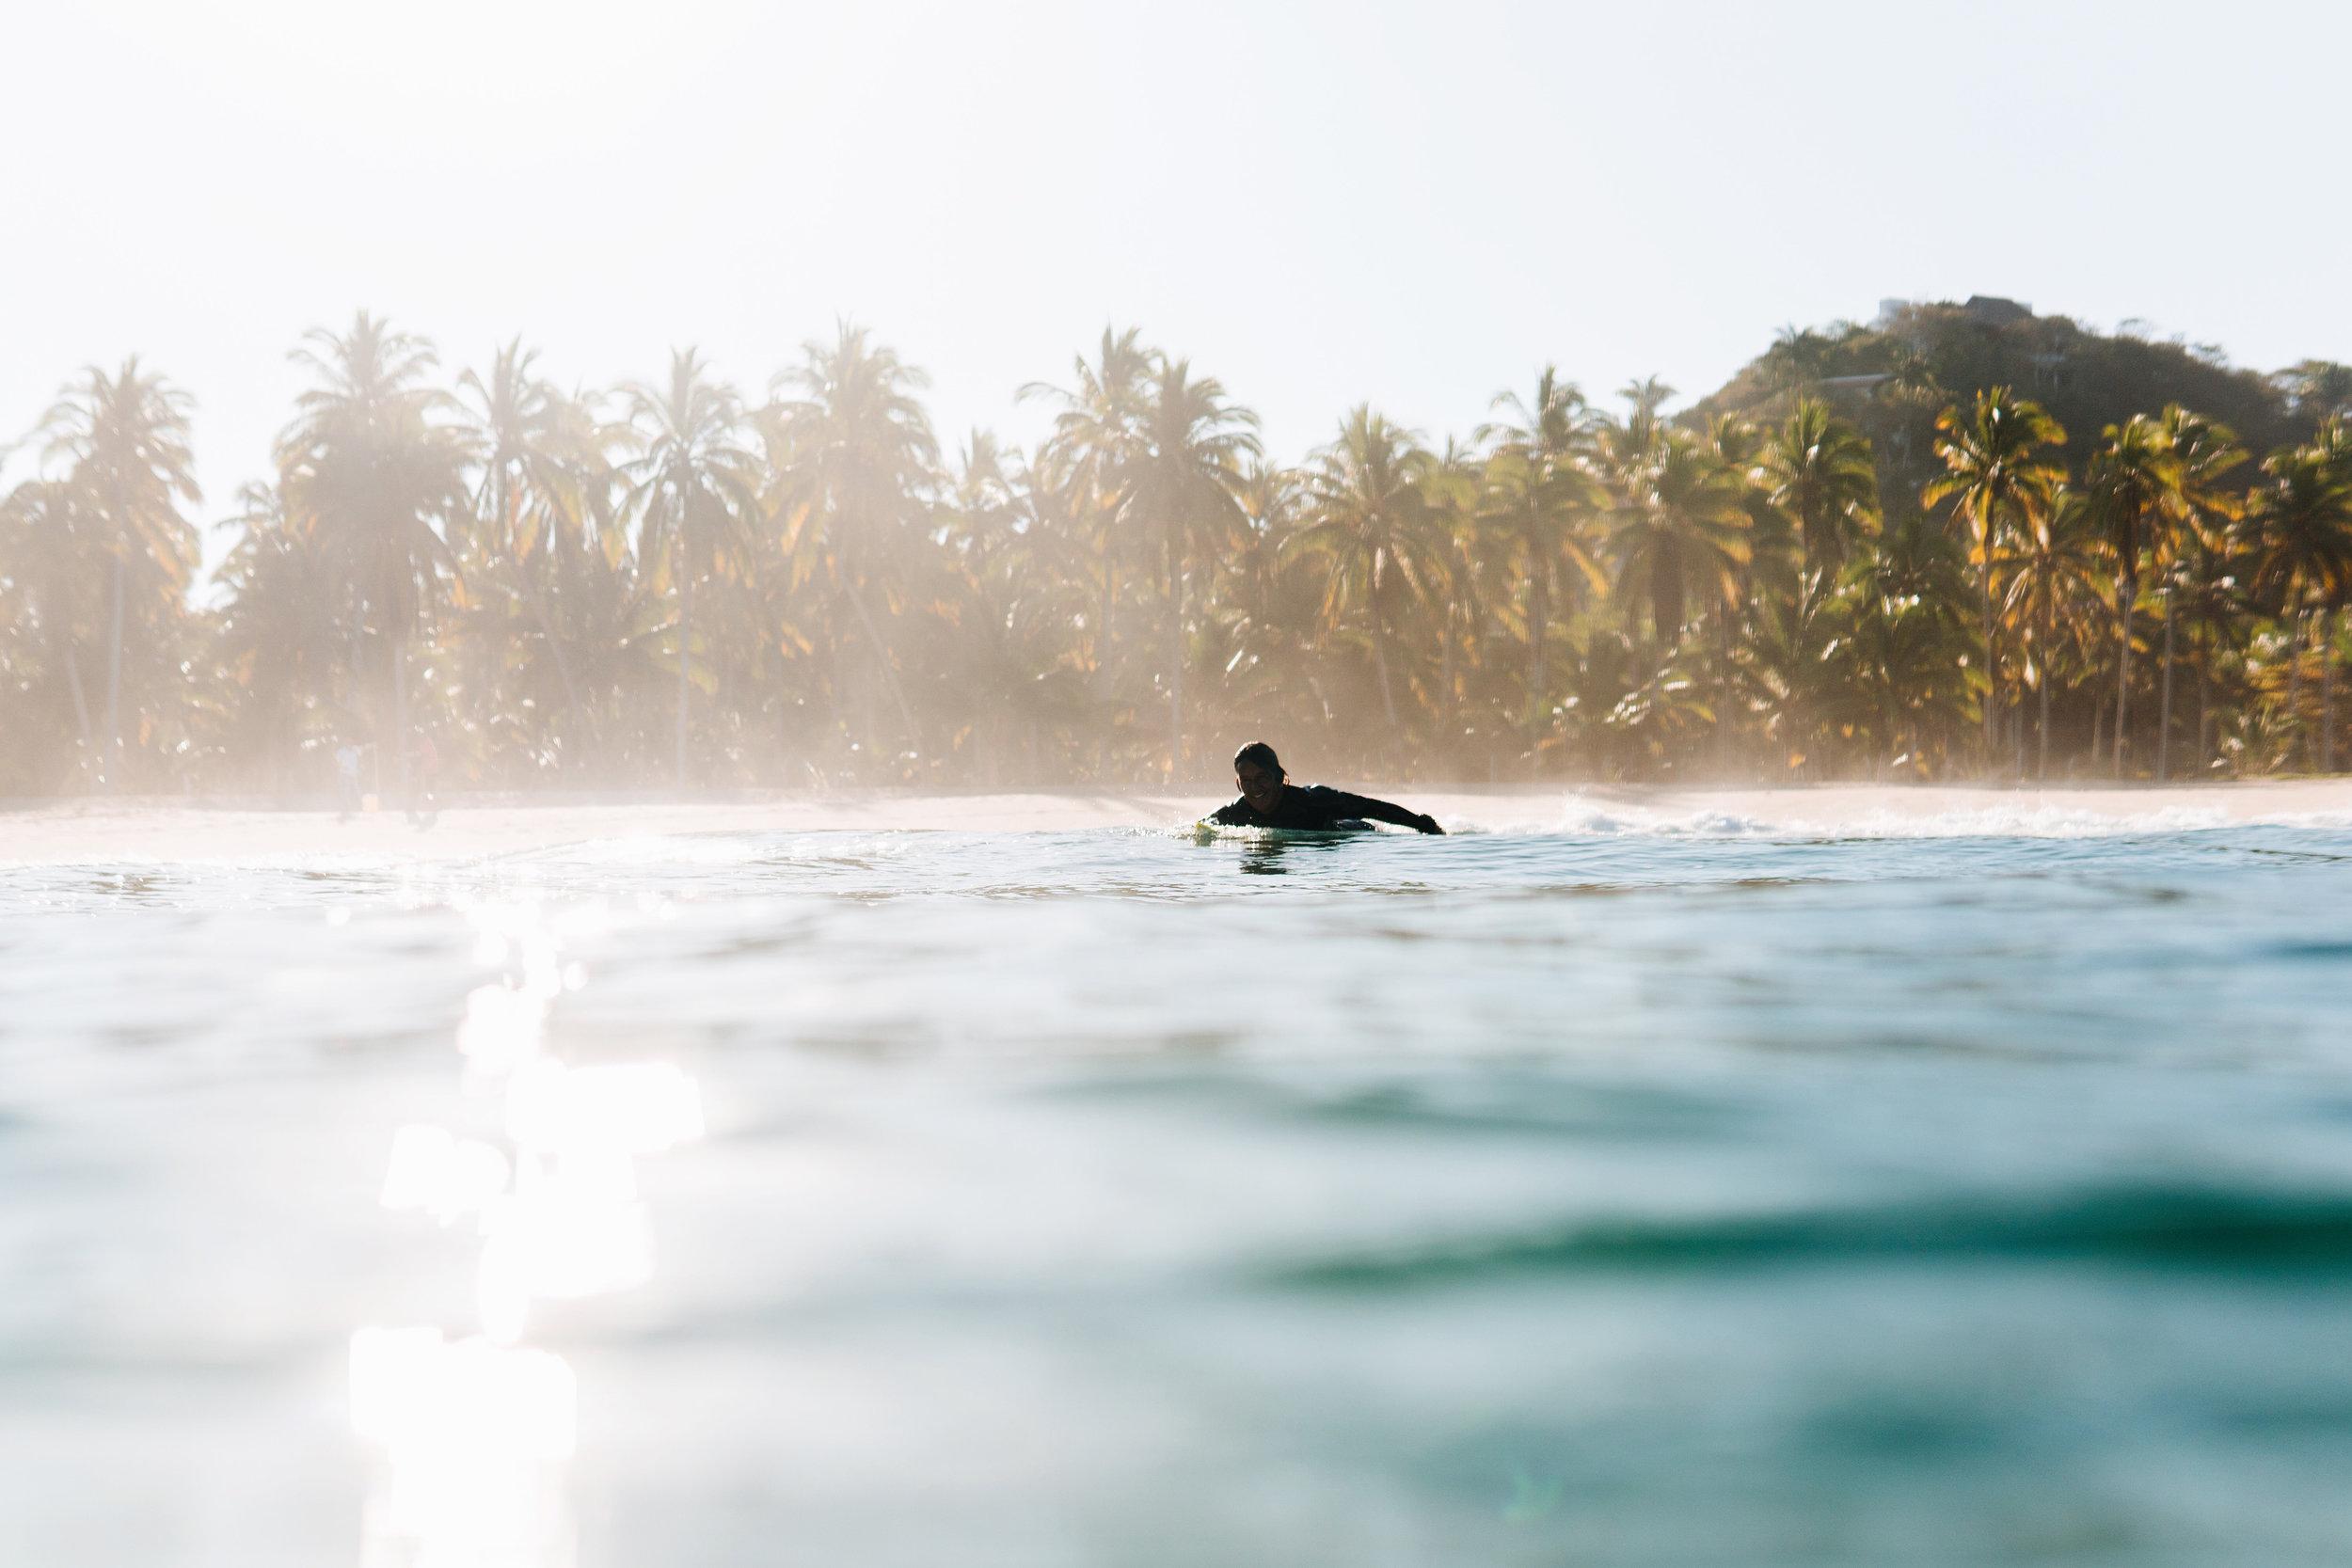 Sayulita-Mexico-Surf-Diego-Cadena-Kalle-Carranza-Dylan-Southworth-Gato-Rodriguez-Julien-Dorian-Gomez-Heiko-Bothe-13.jpg